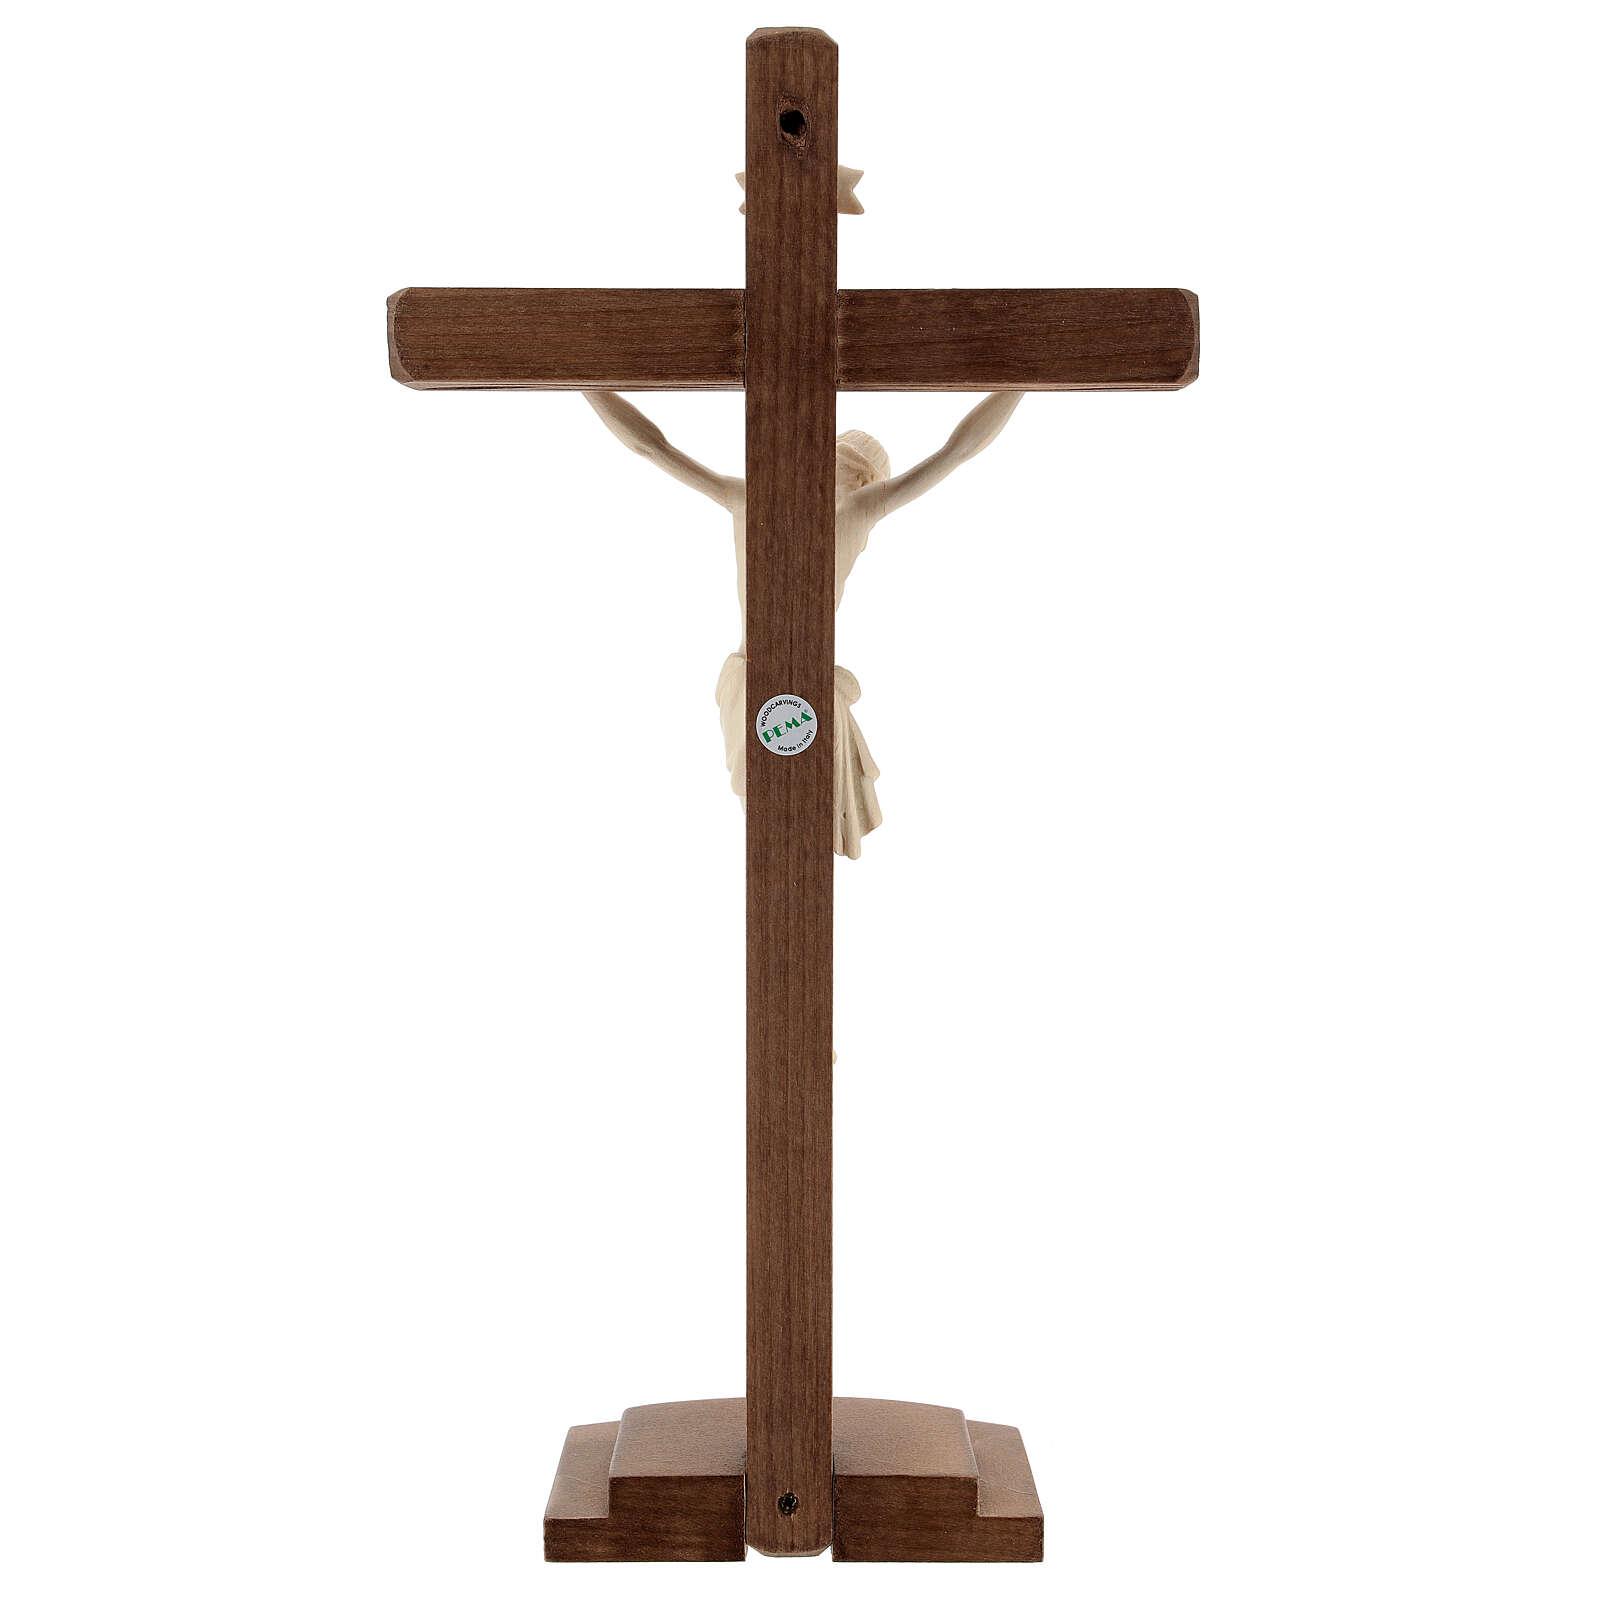 Kruzifix Mod. Siena rechten Kreuz Grödnertal Naturholz mit Basis 4